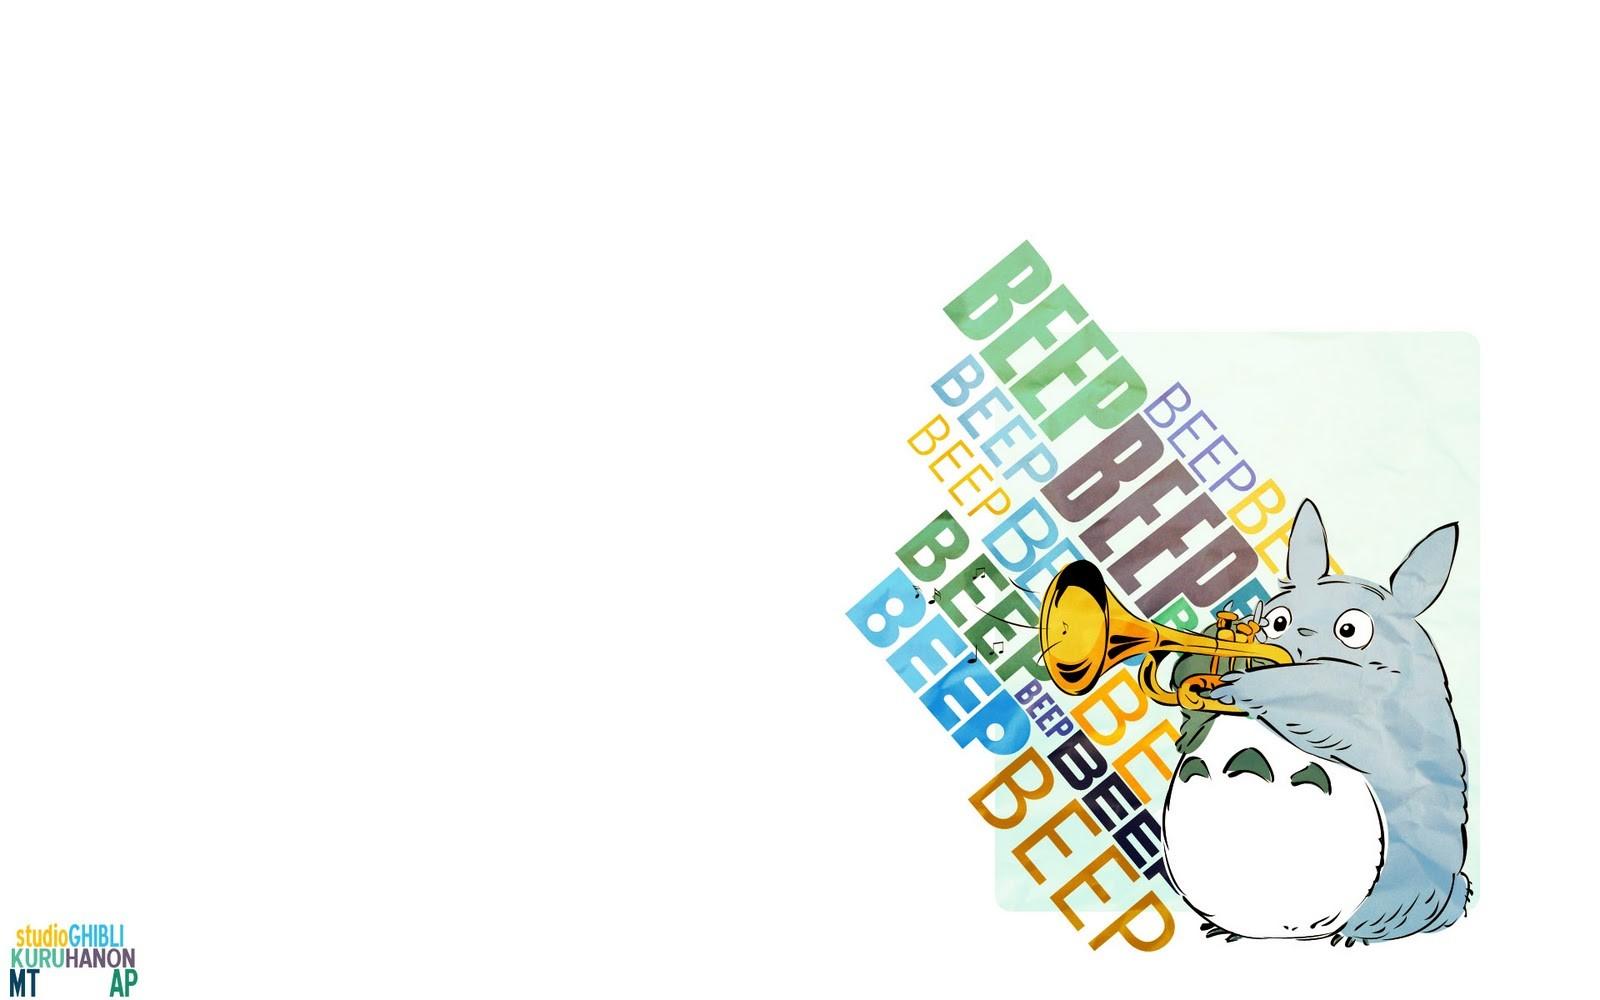 Anime 1600x1000 anime Totoro My Neighbor Totoro Studio Ghibli simple background white background musical instrument